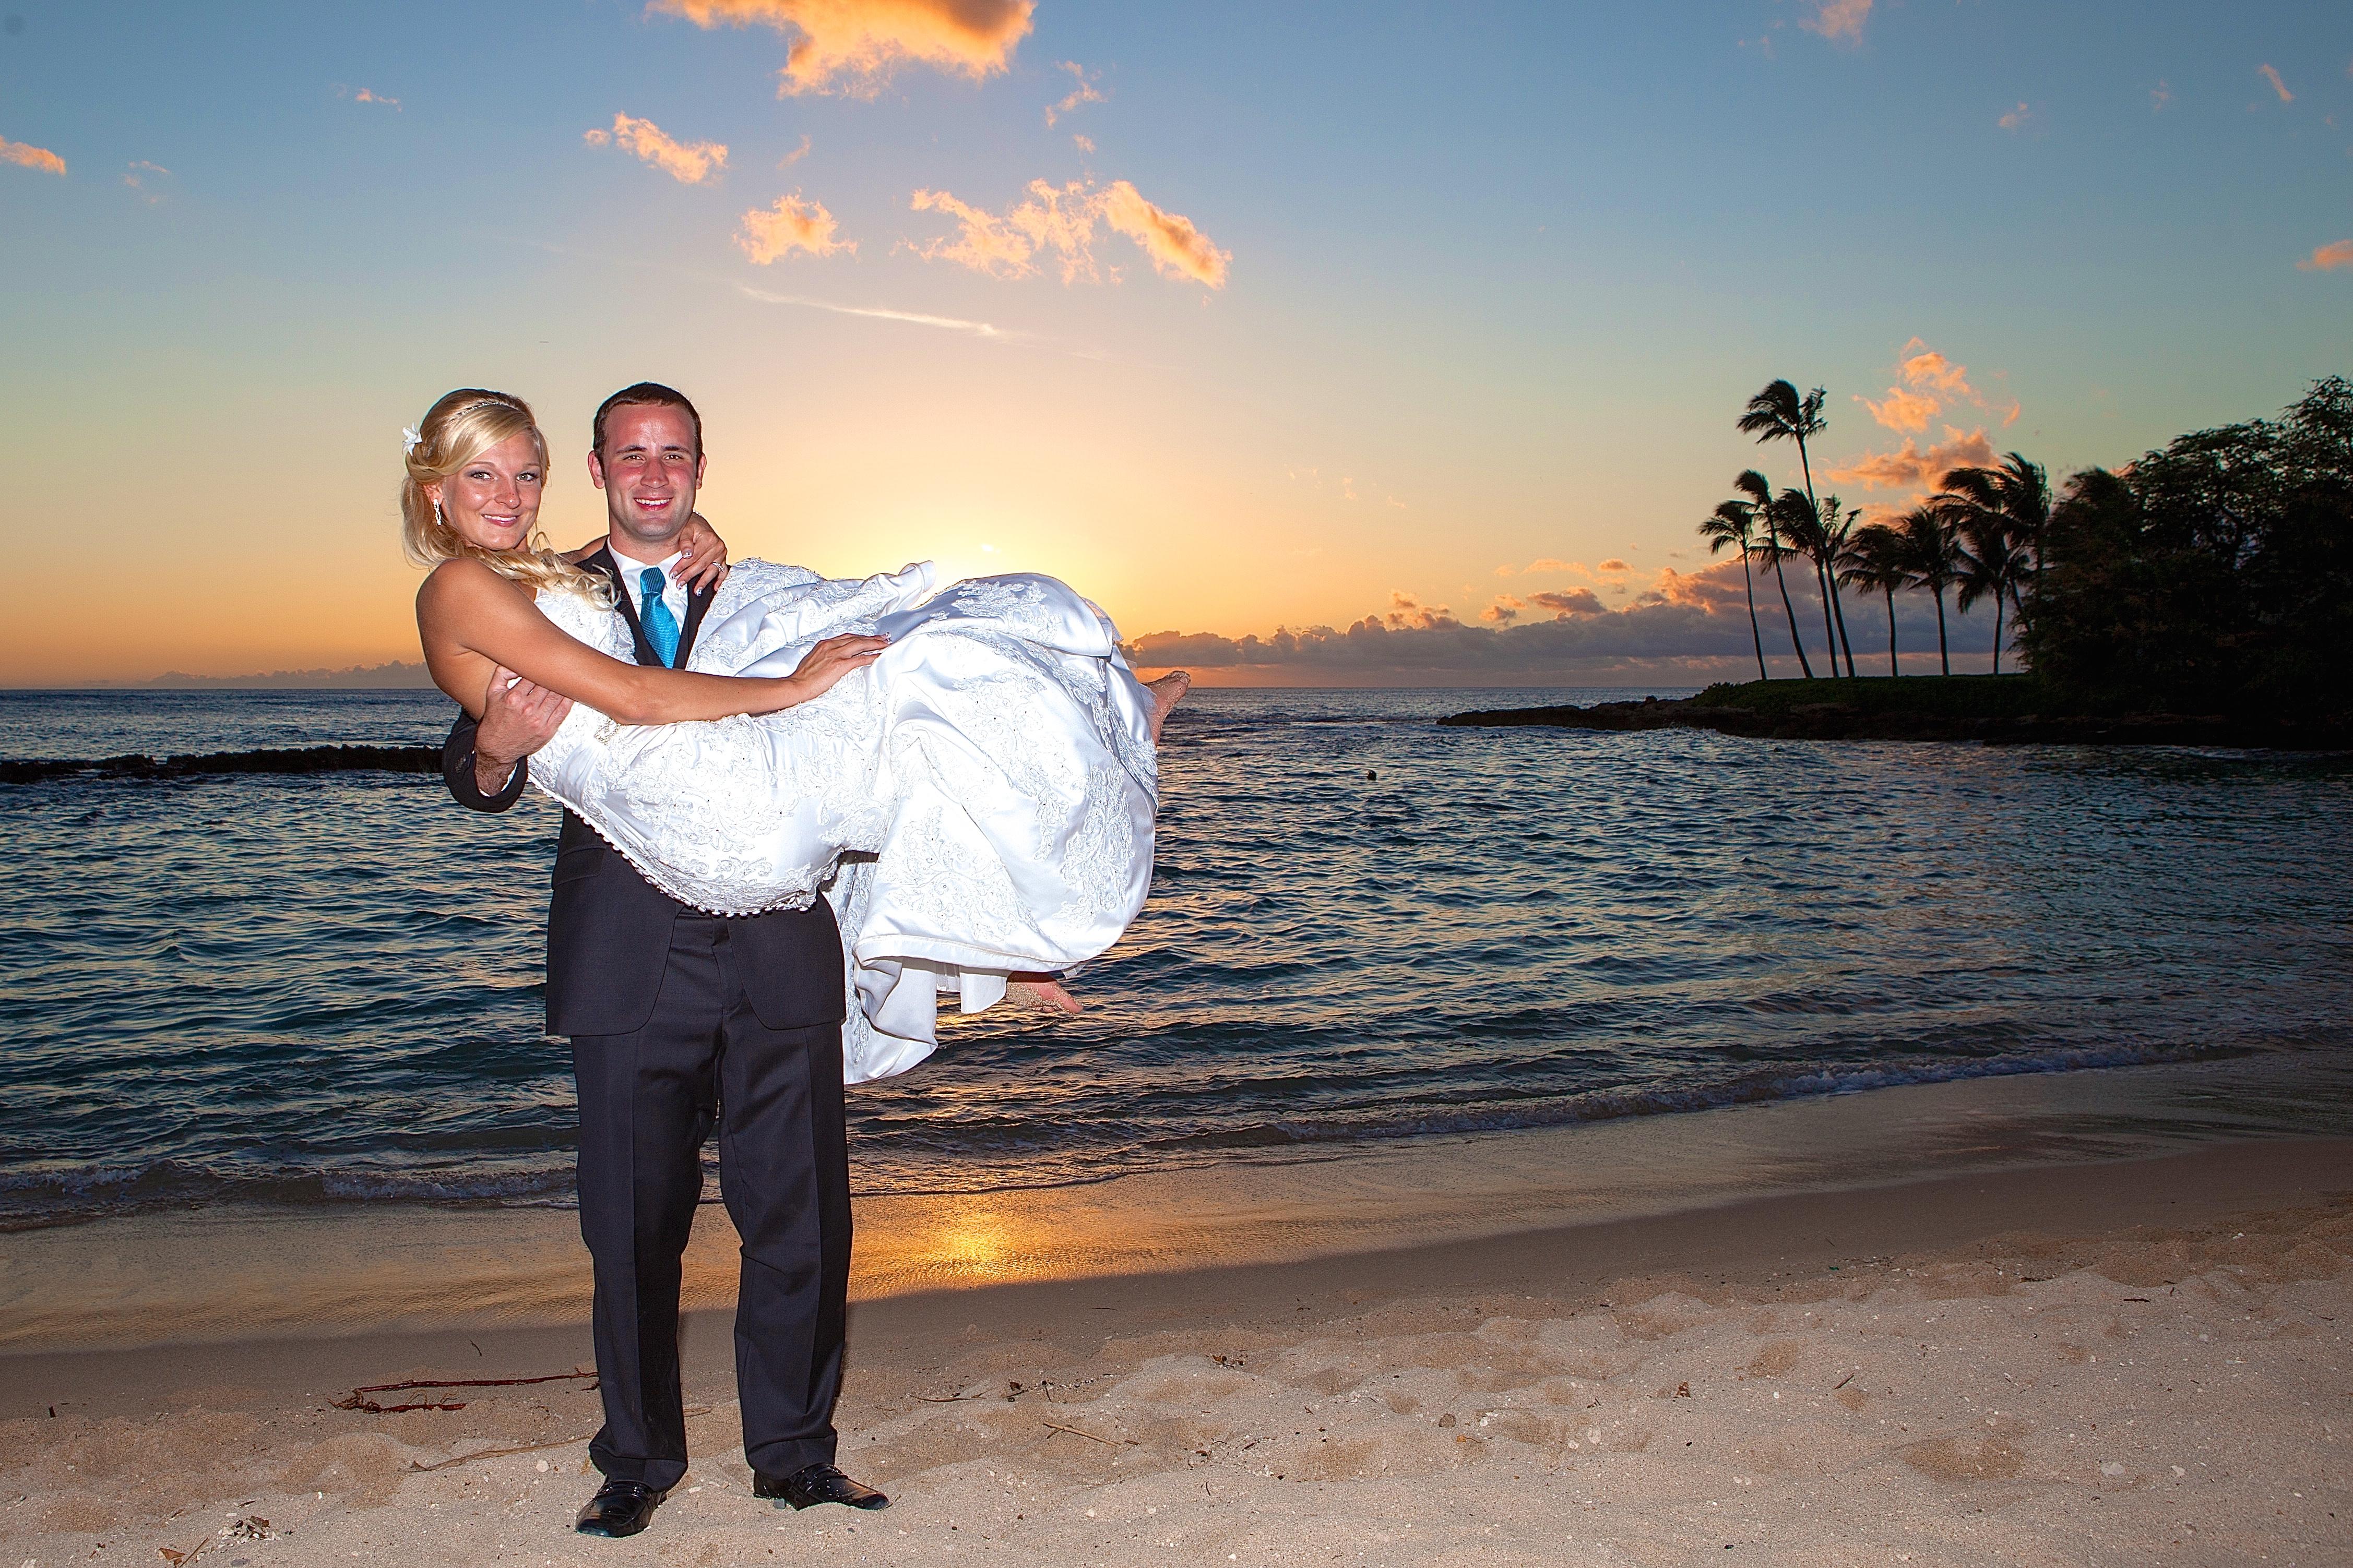 Sunset wedding photos in Hawaii 14